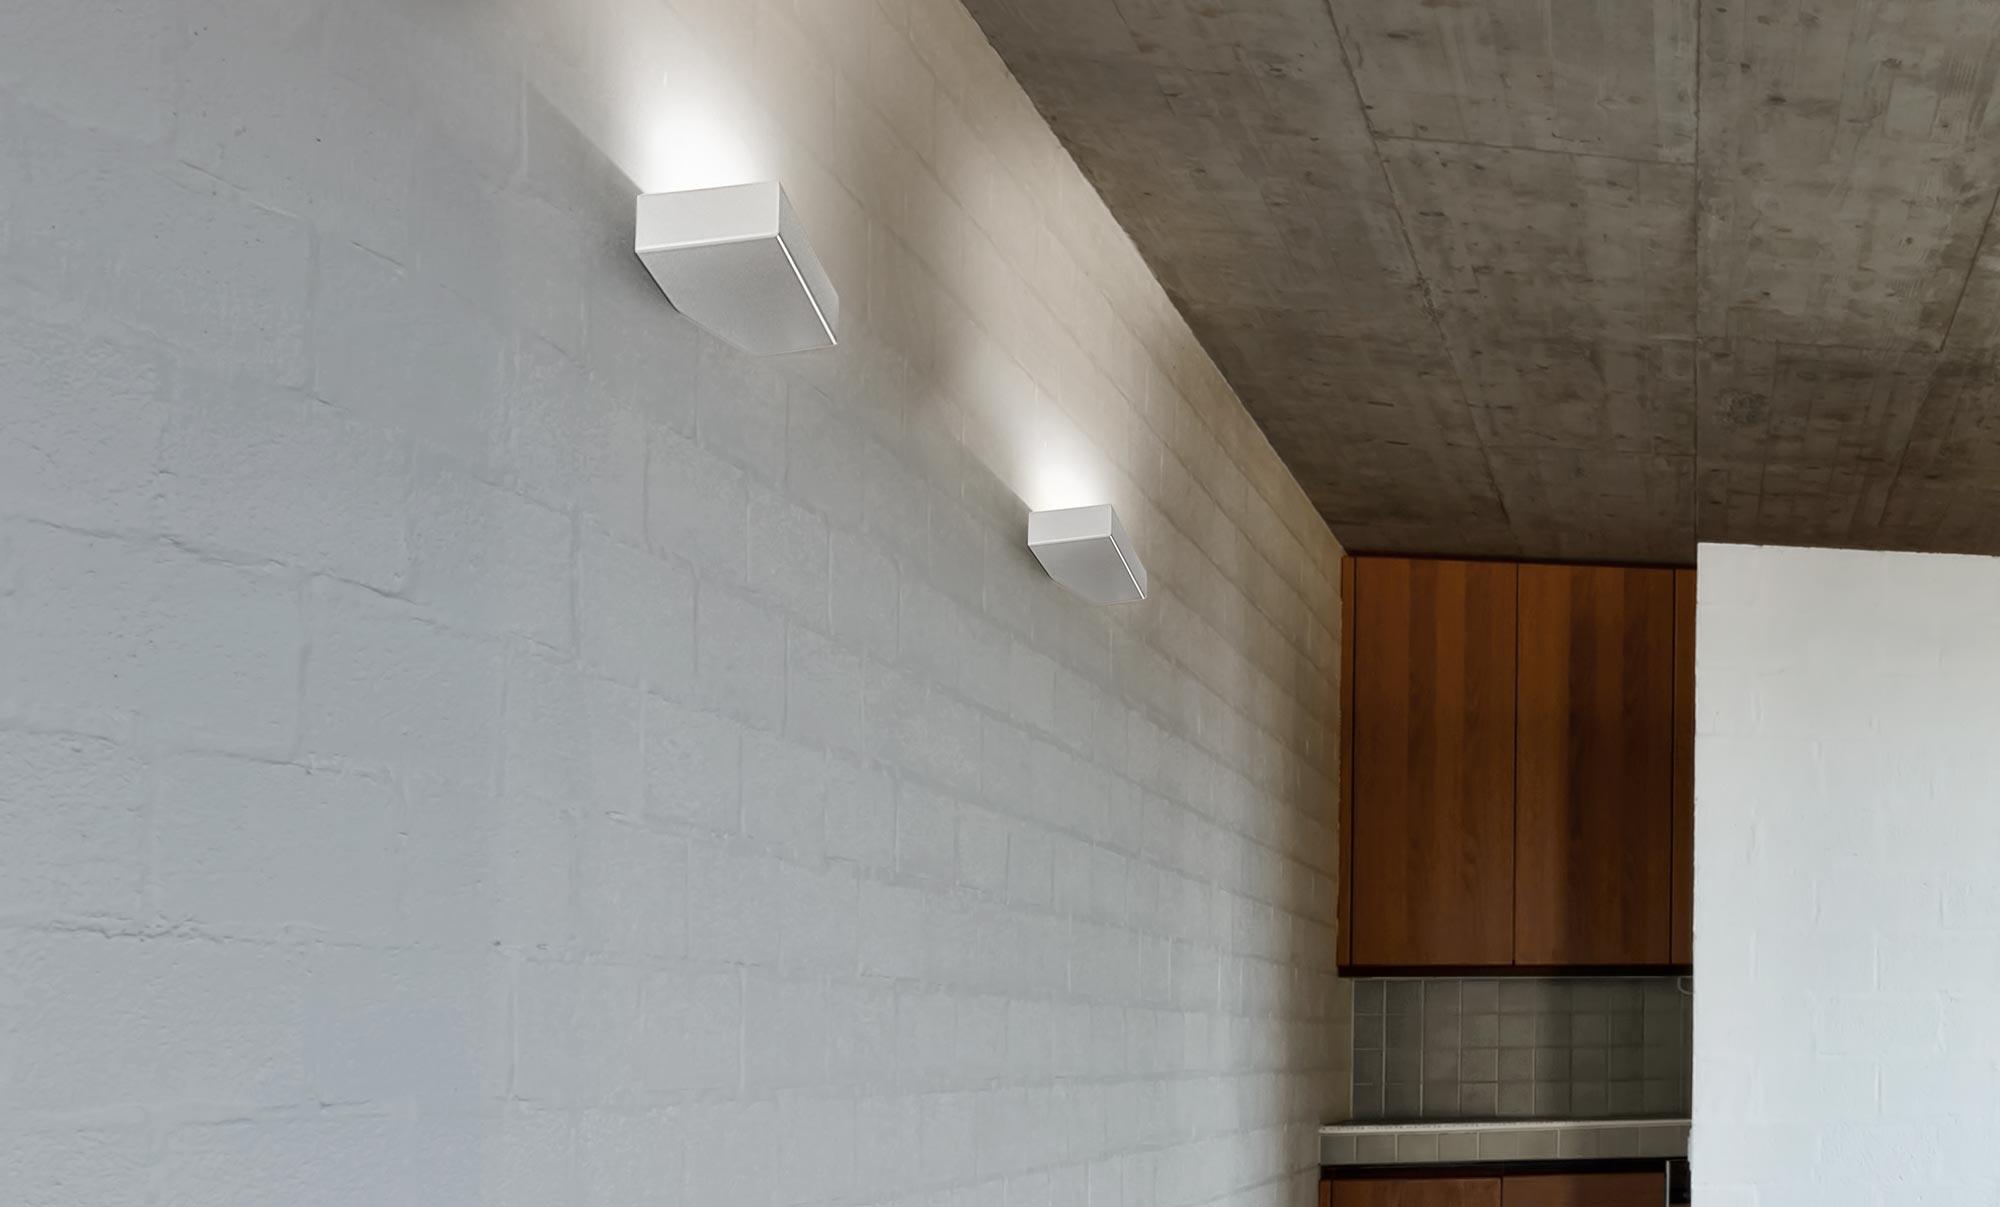 Wall lights cirillo lighting and ceramics inspiration gallery aloadofball Images